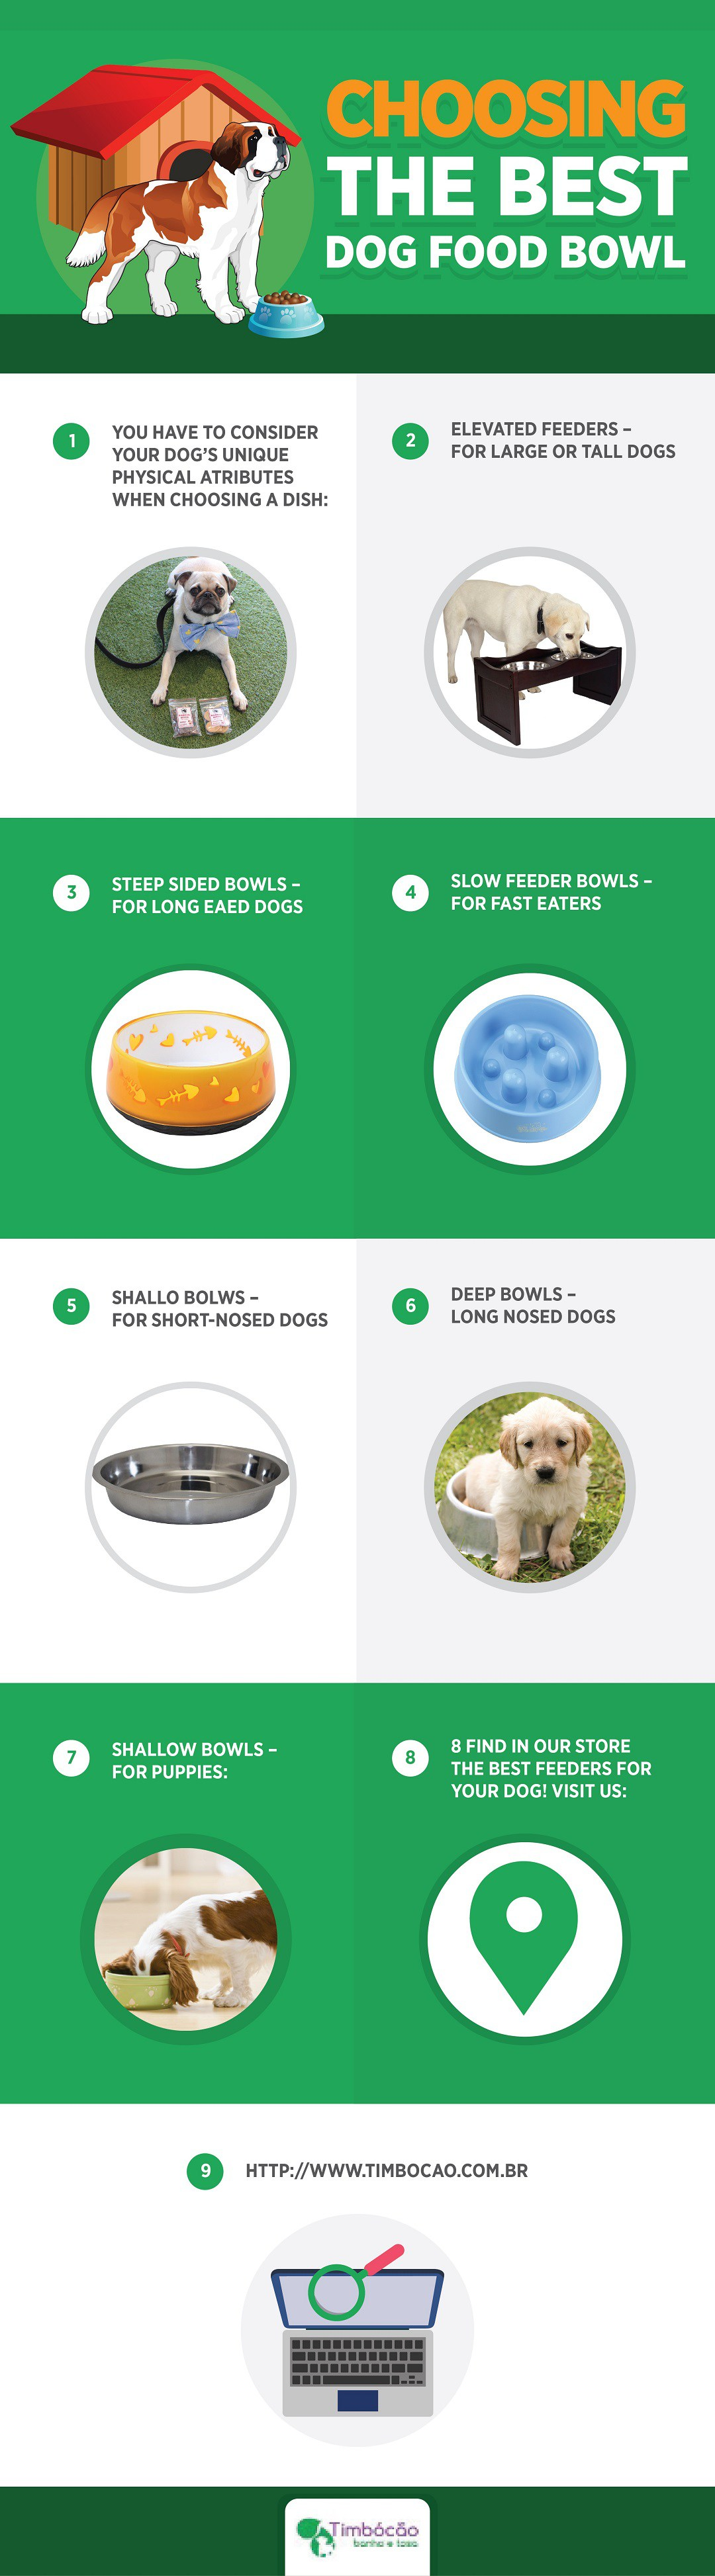 Choosing the Best Dog Food Bowl